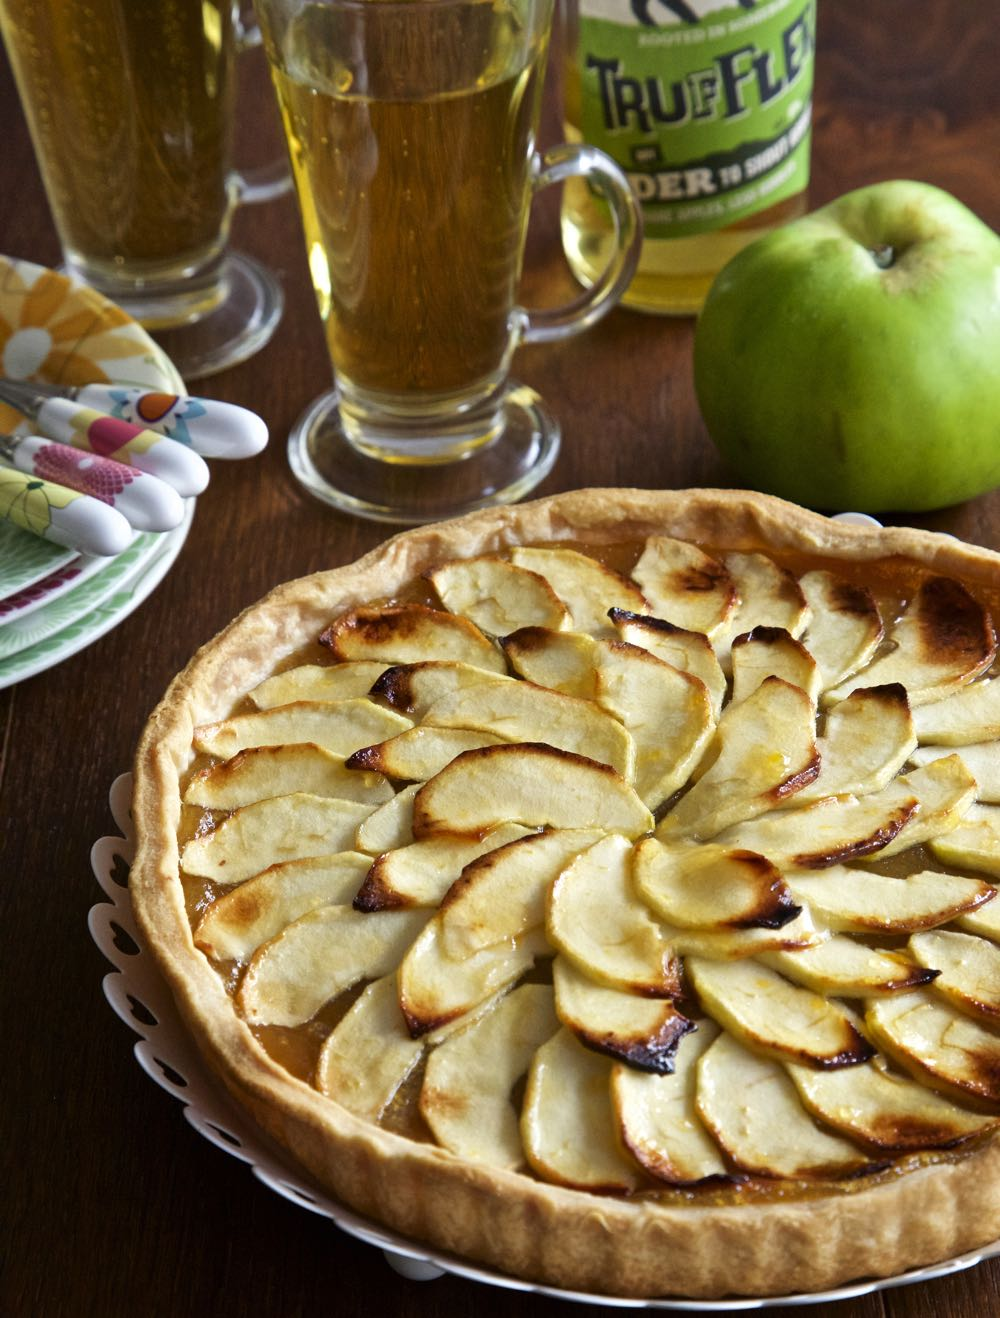 A rustic, vegan apple tart with Somerset cider.